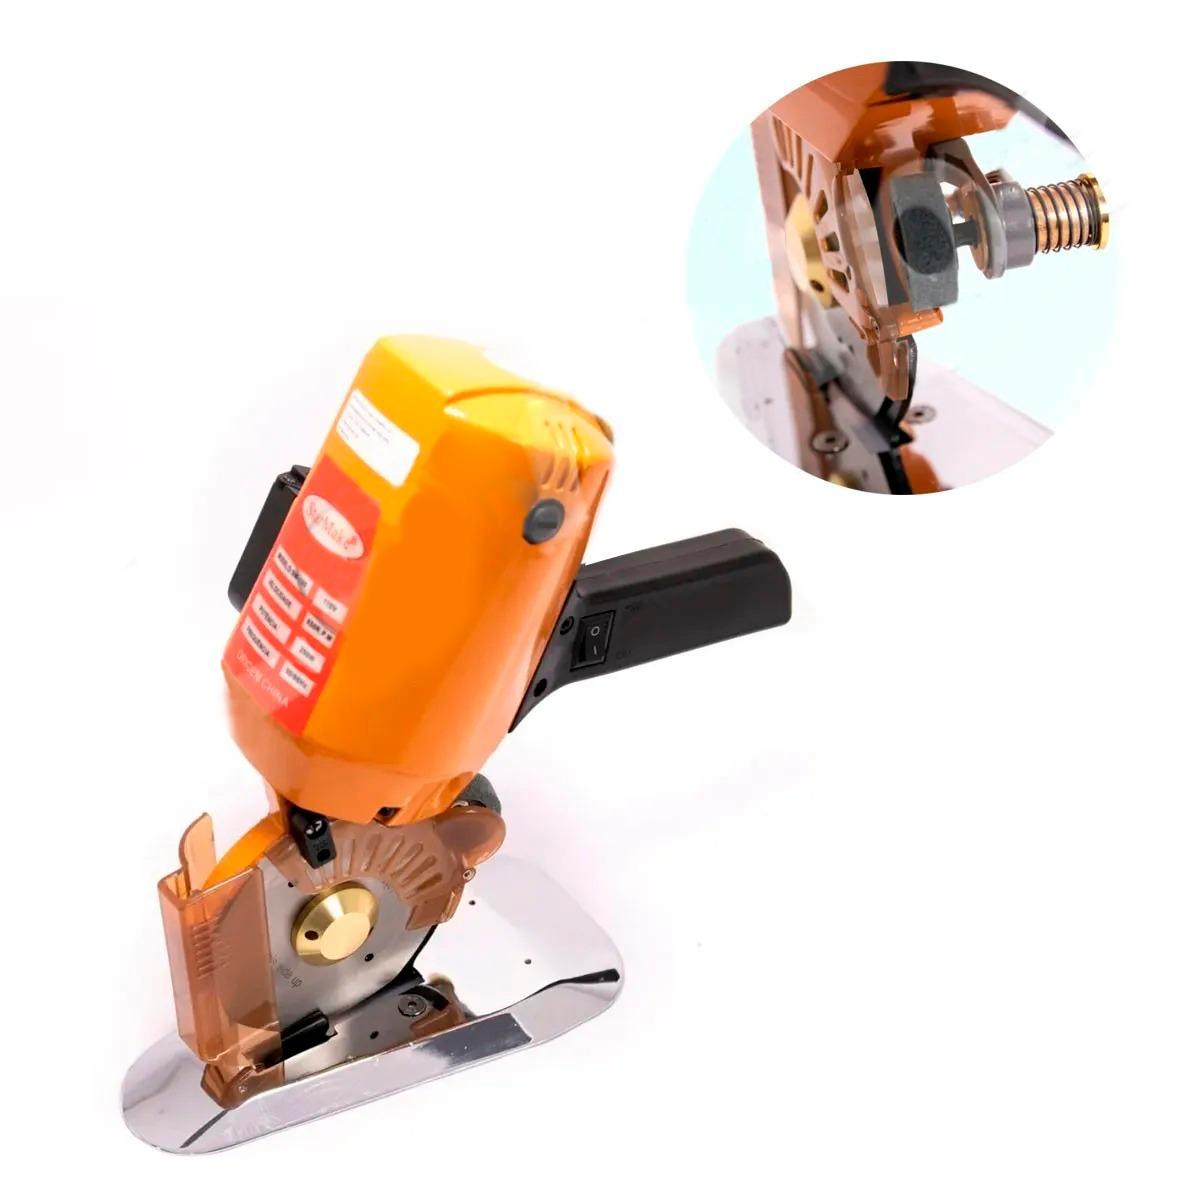 Máquina De Corte Cortar Tecido Disco Octogonal 250 Watts